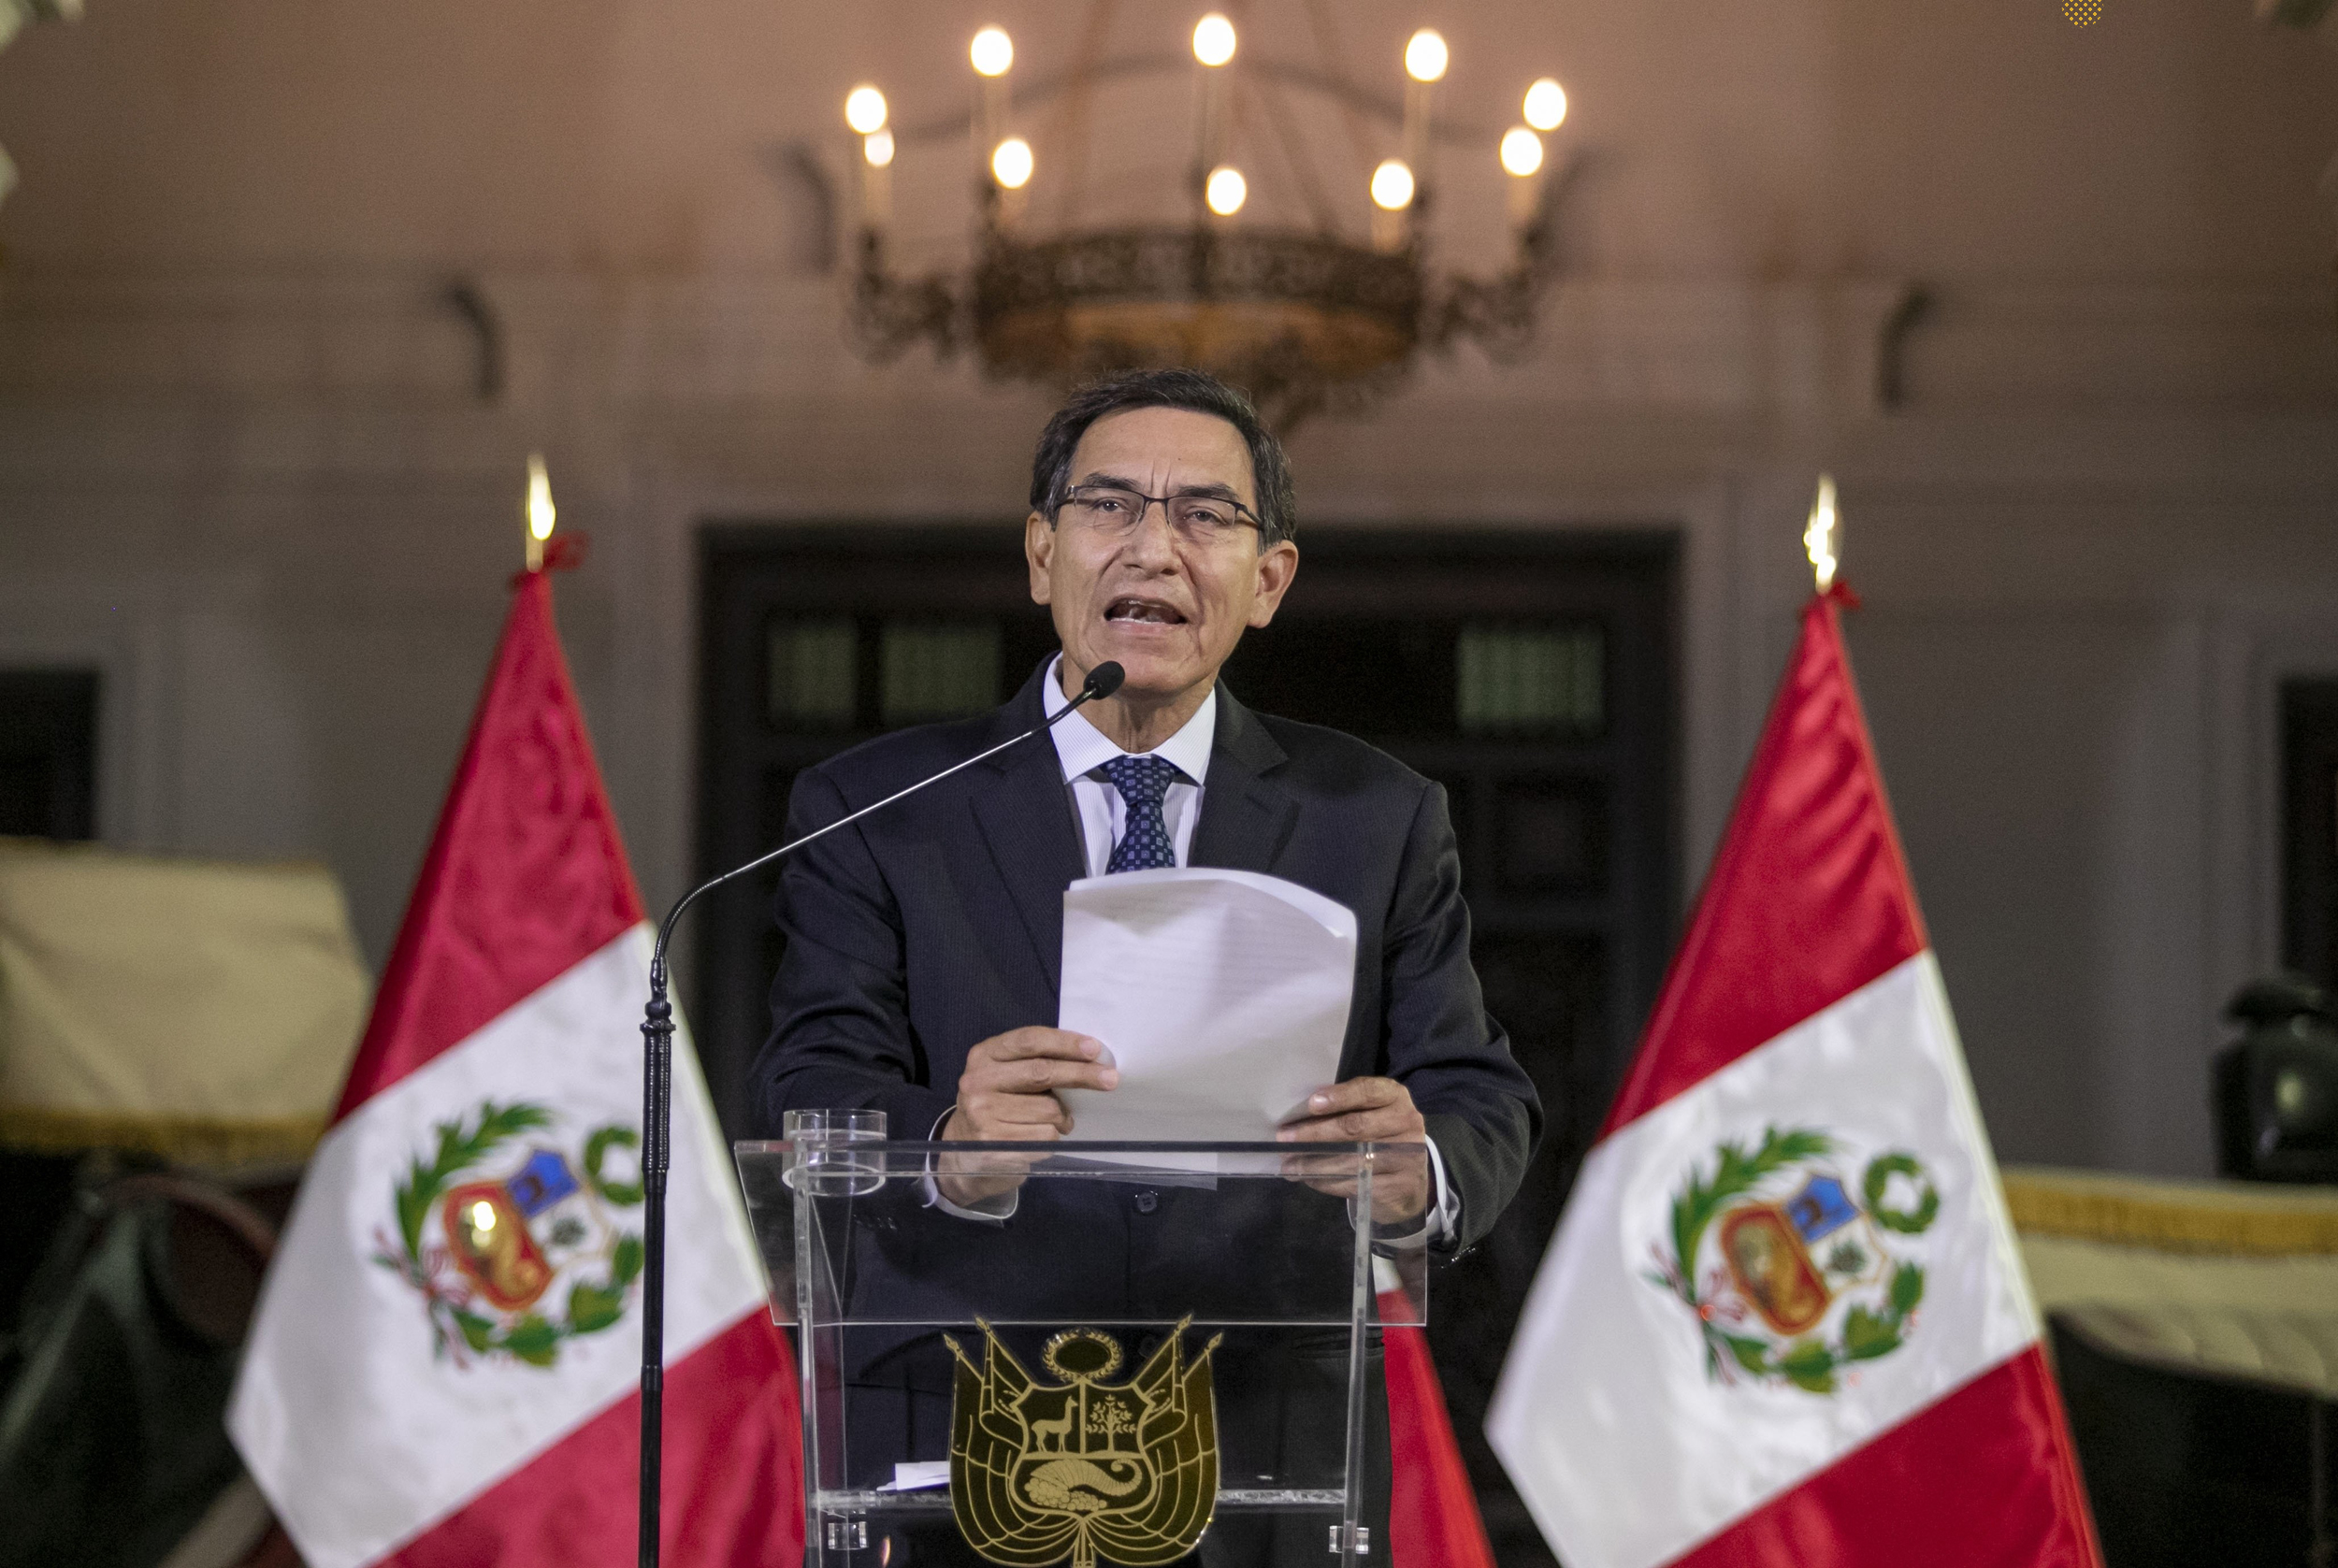 Peru president dissolves congress amid anti-corruption push